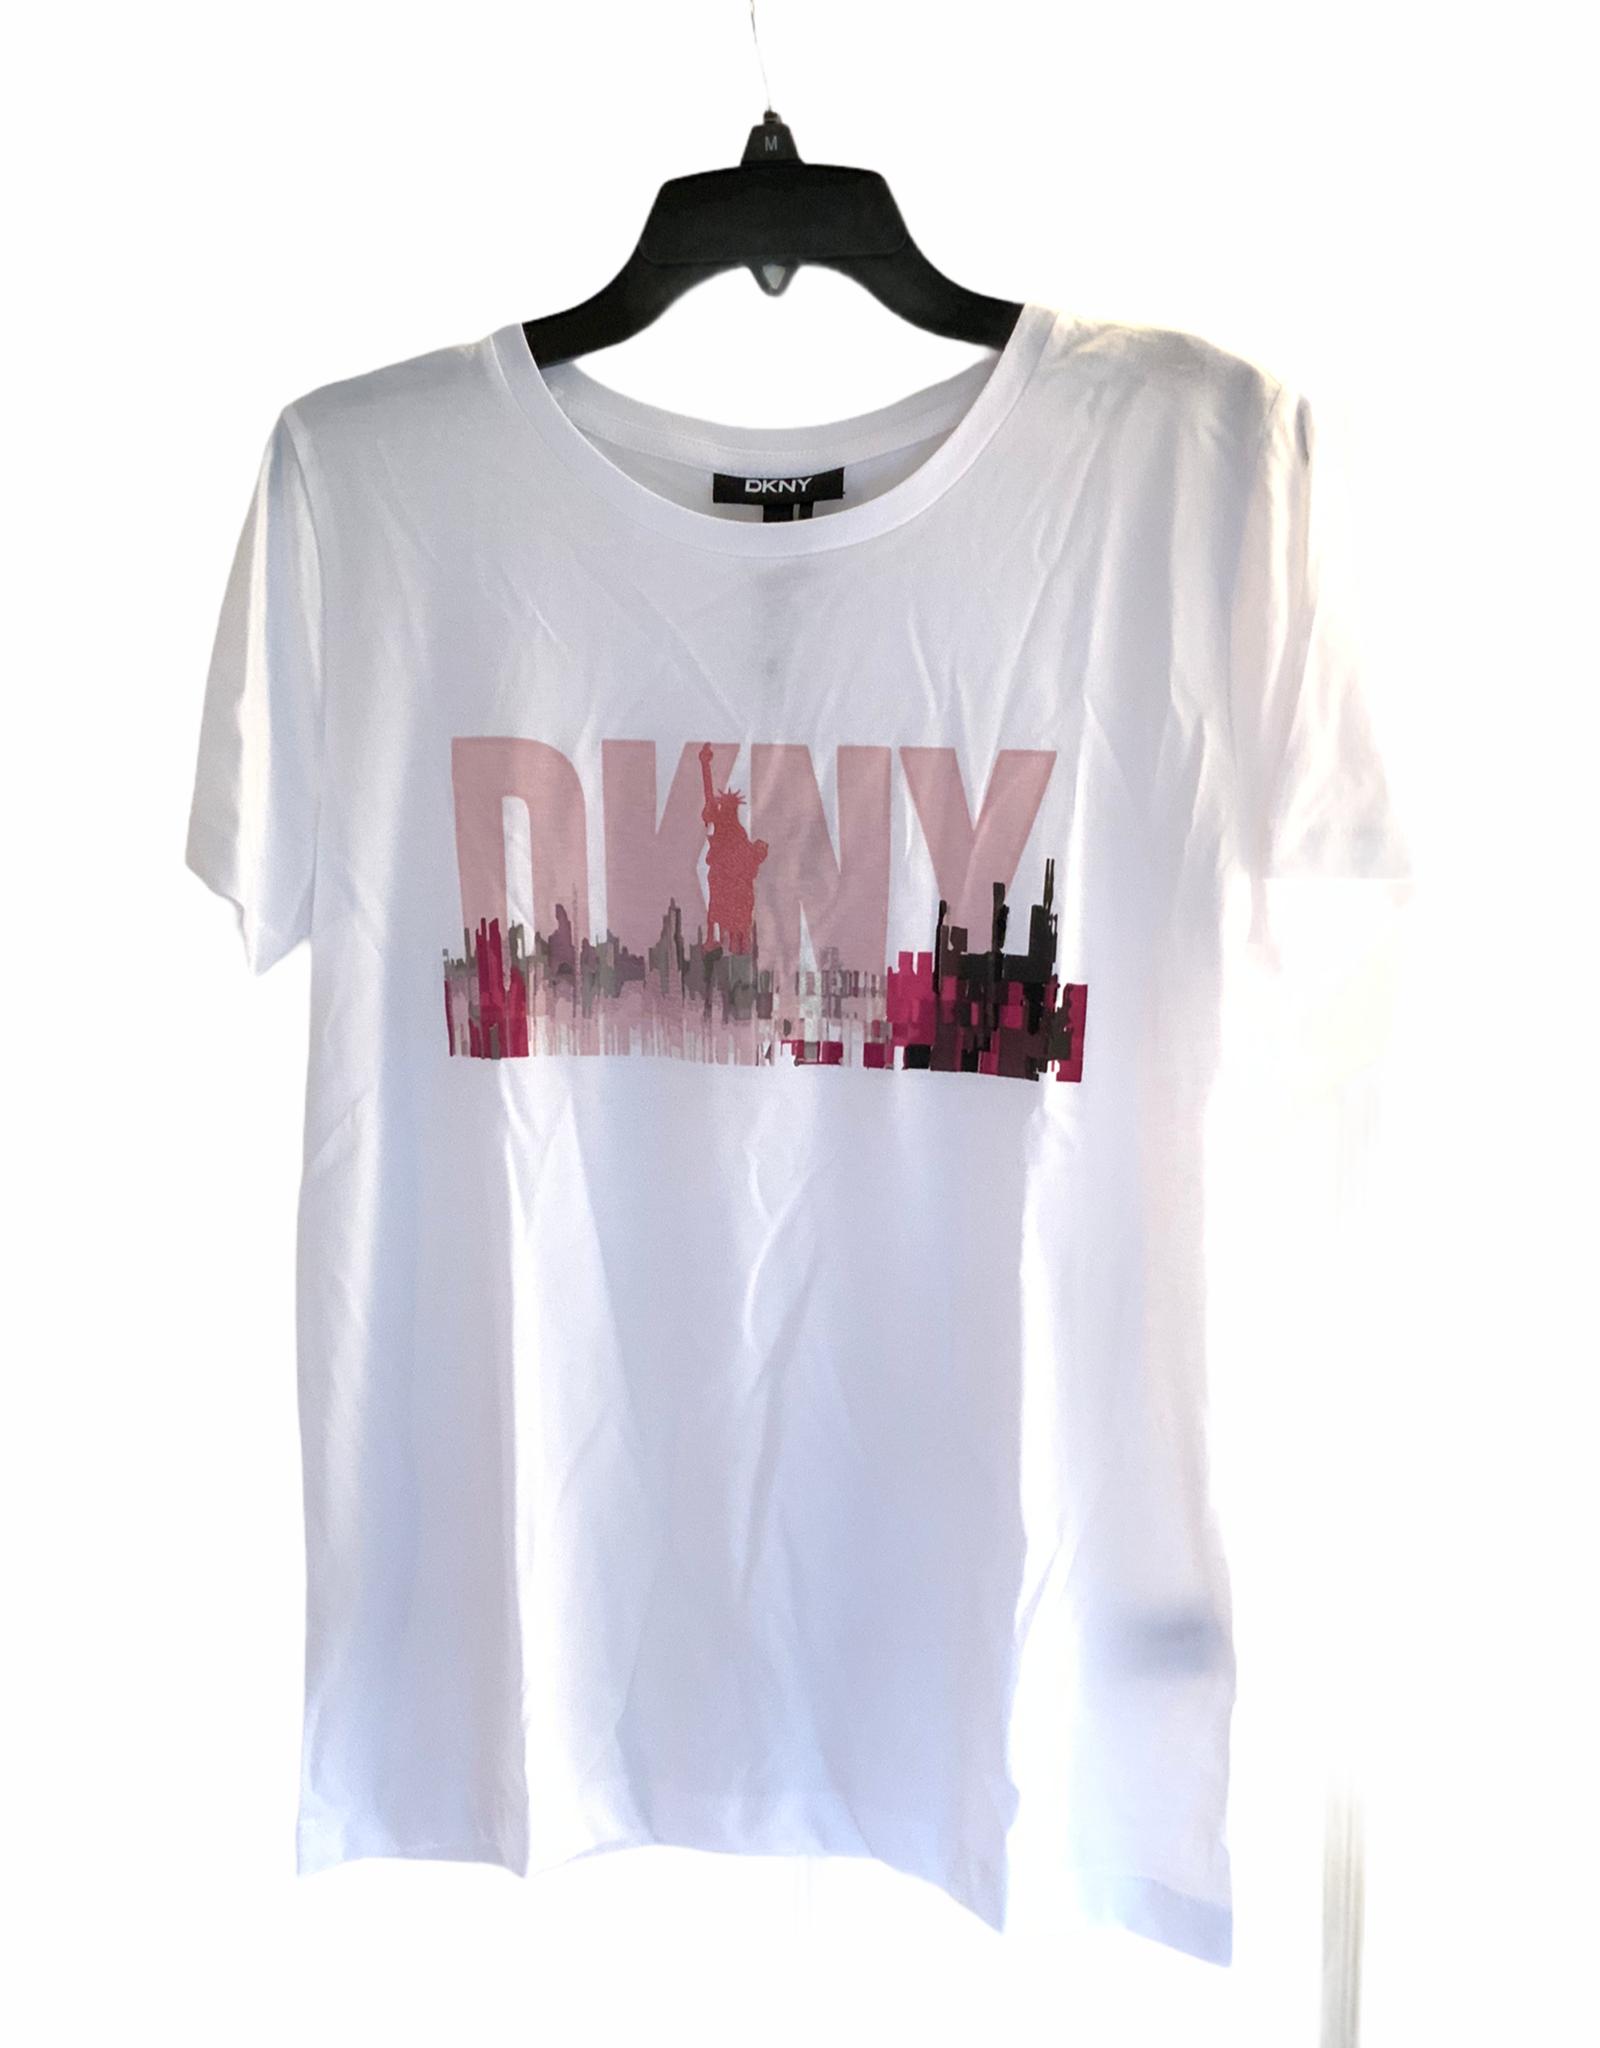 DKNY DKNY Tee Glitter Lady Liberty Skyline